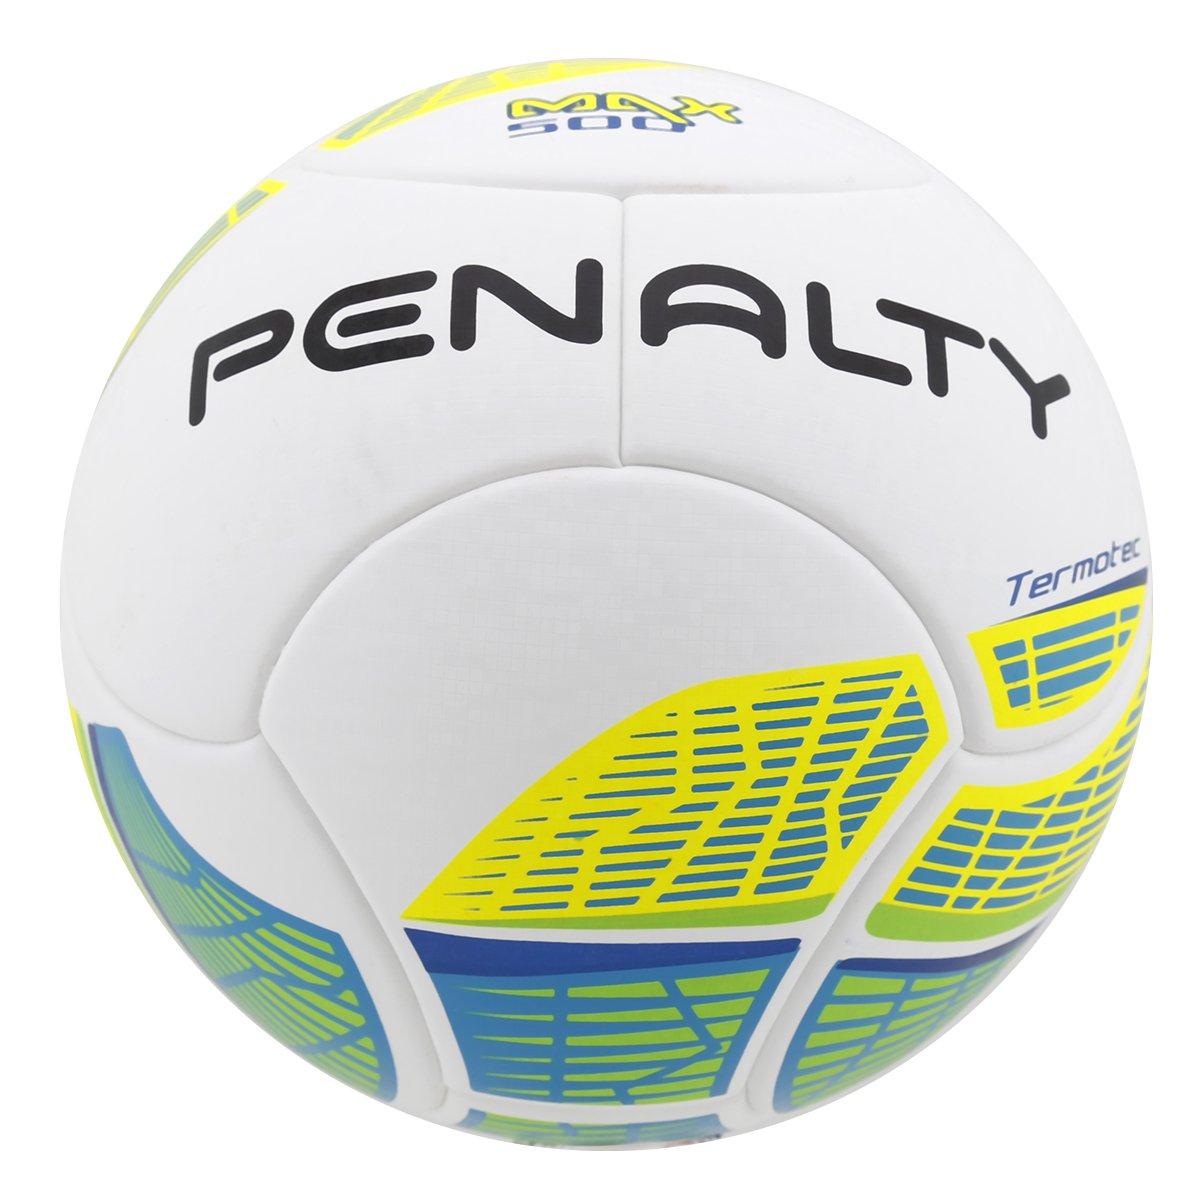 fdb4e382492da Bola Futebol Penalty Max 500 Termotec 5 Futsal - Compre Agora